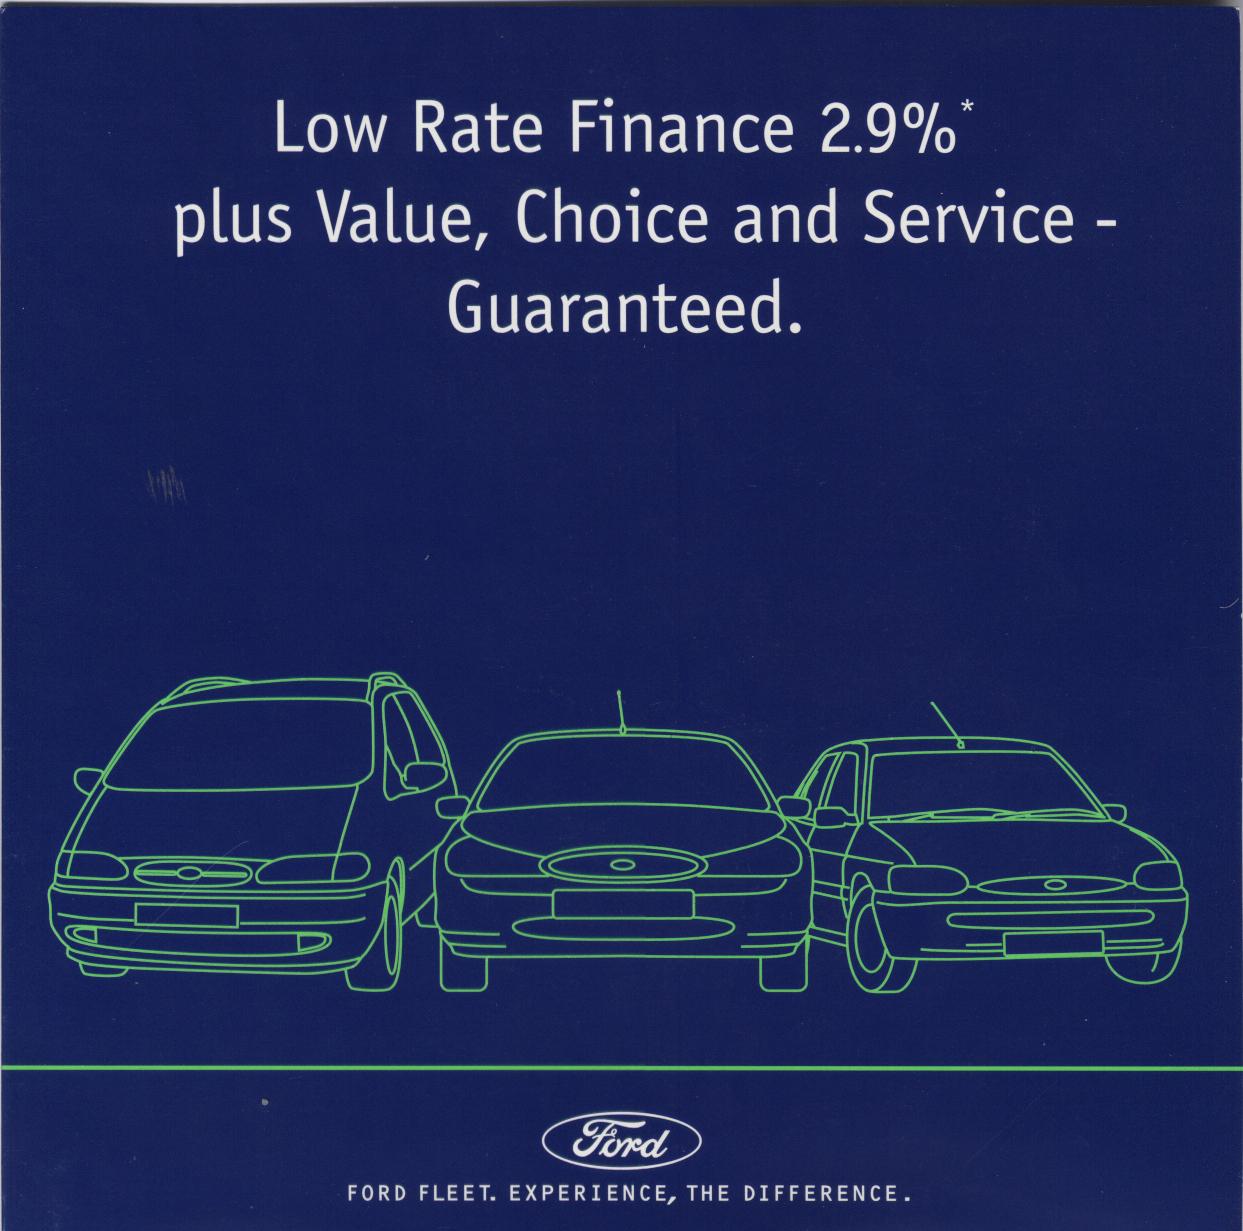 FordFinance.jpg